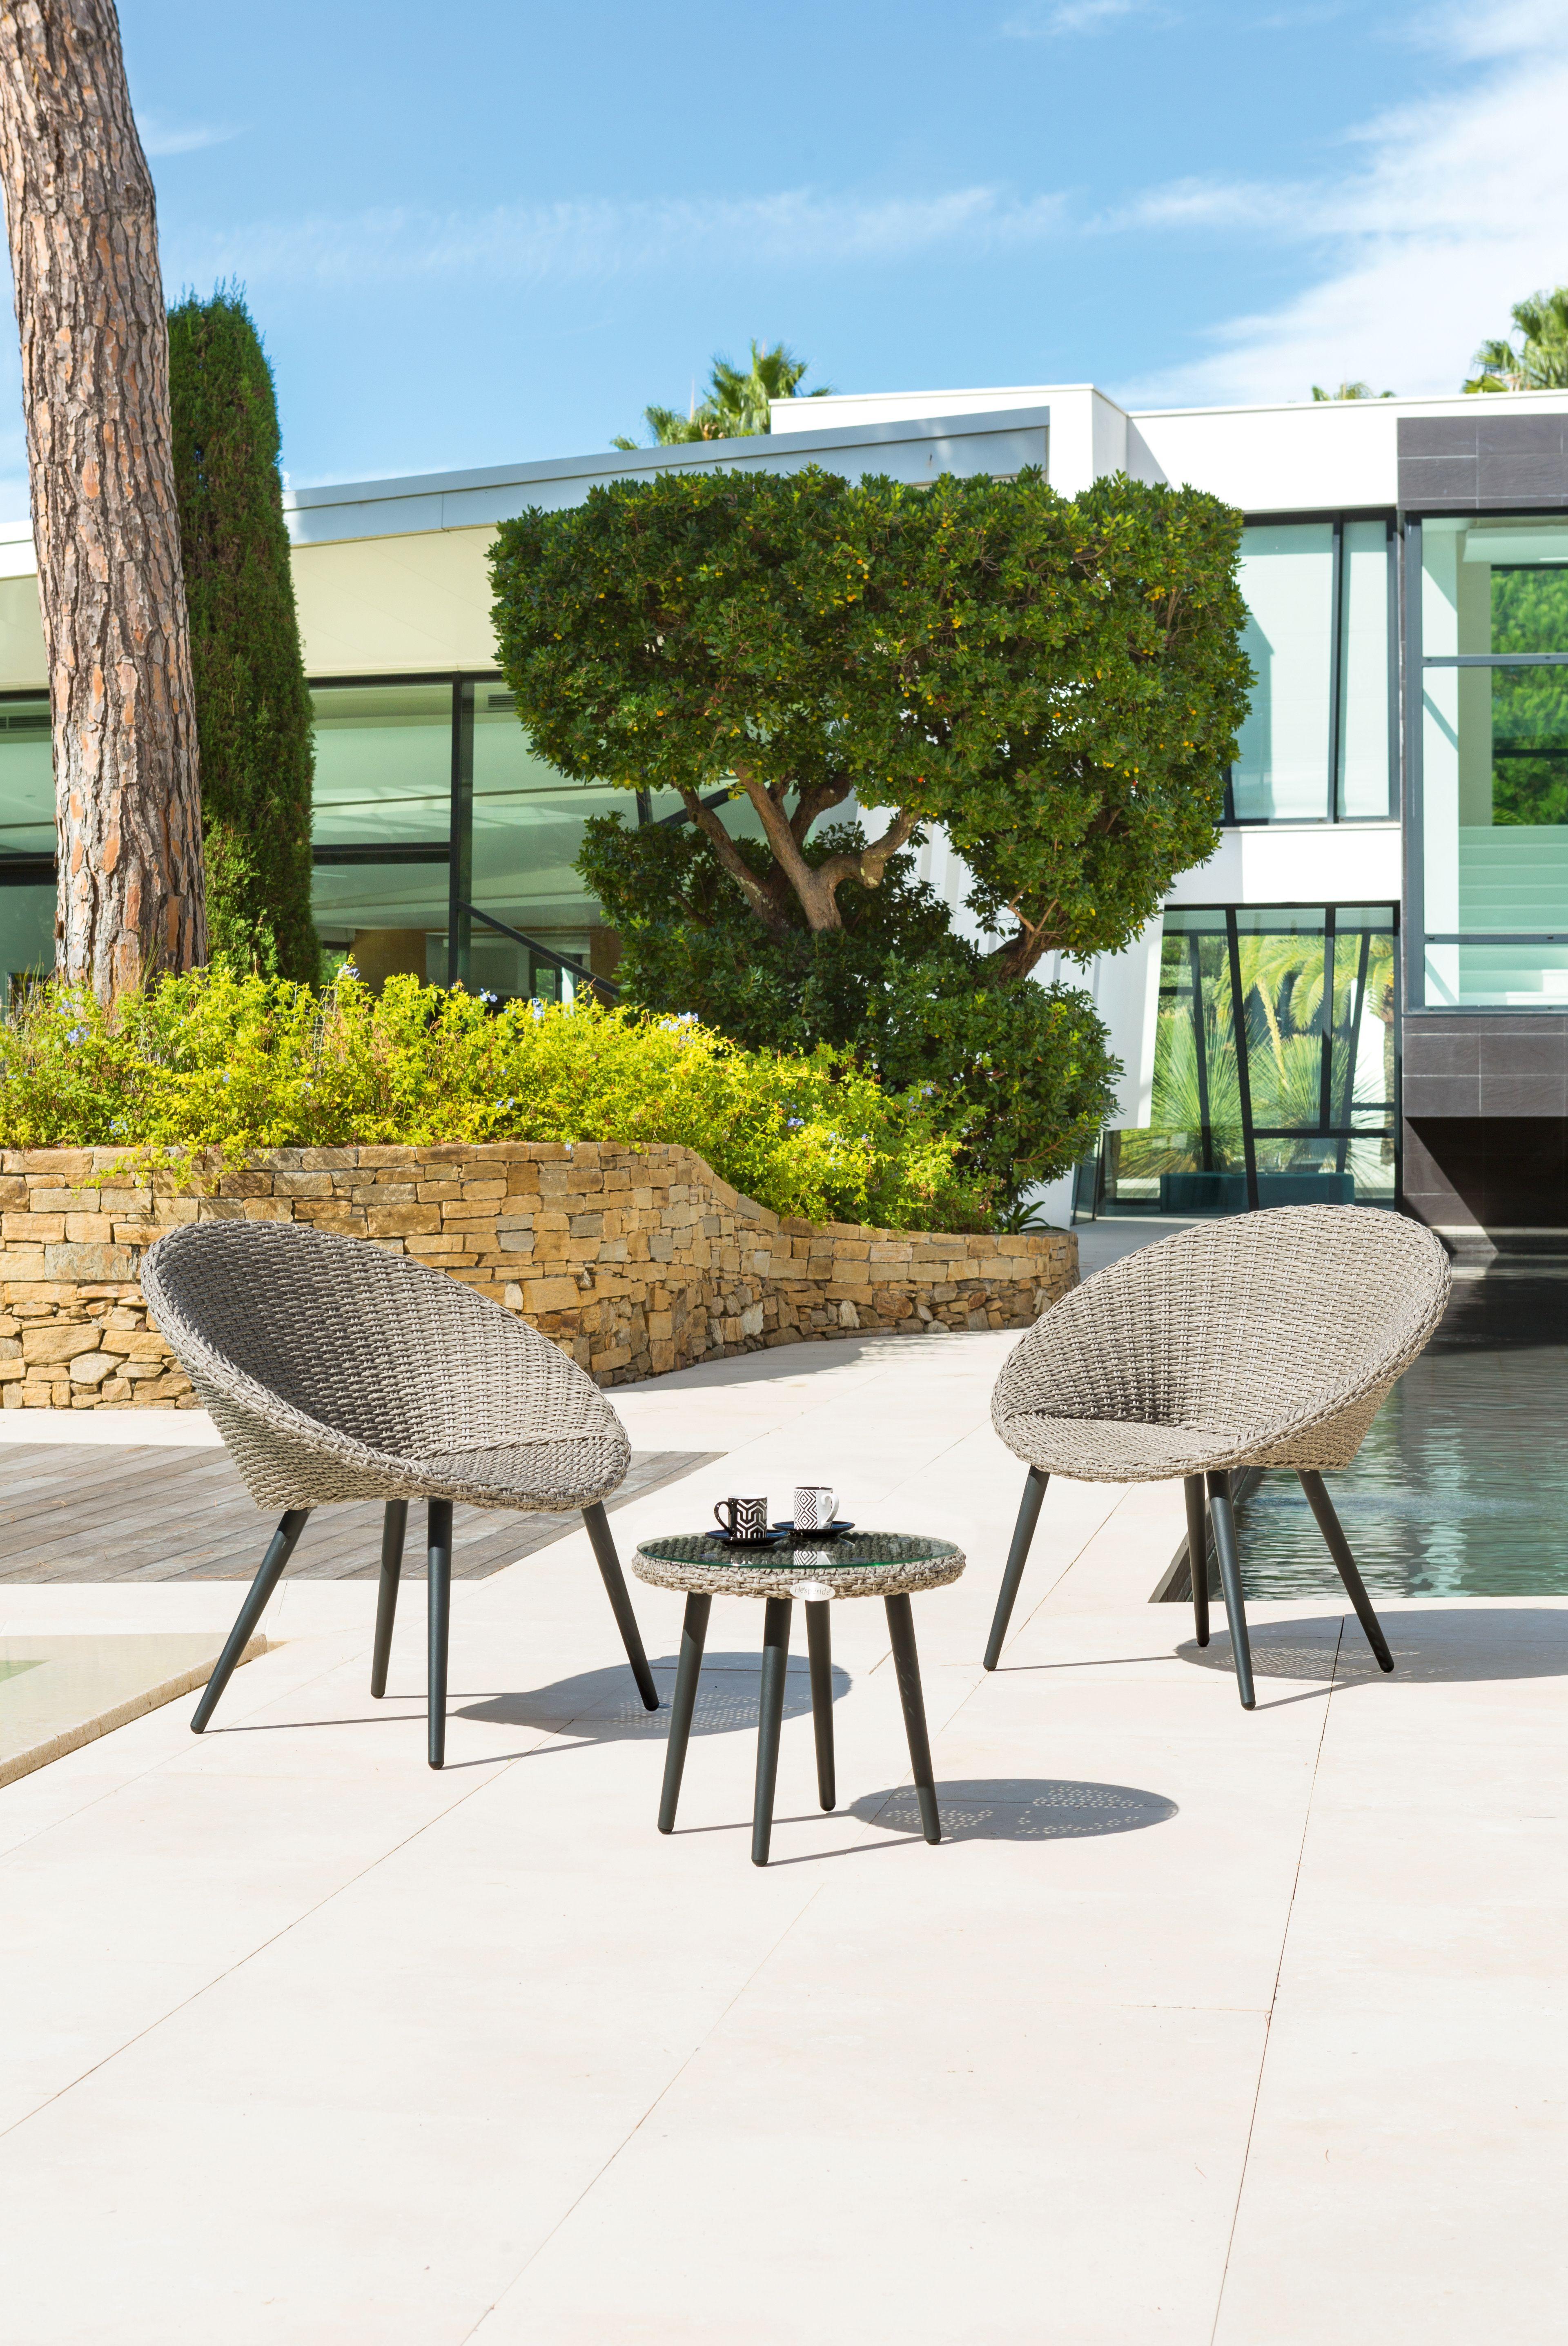 salon de jardin centrakor en 2020 table de jardin pliante salon de jardin meuble jardin